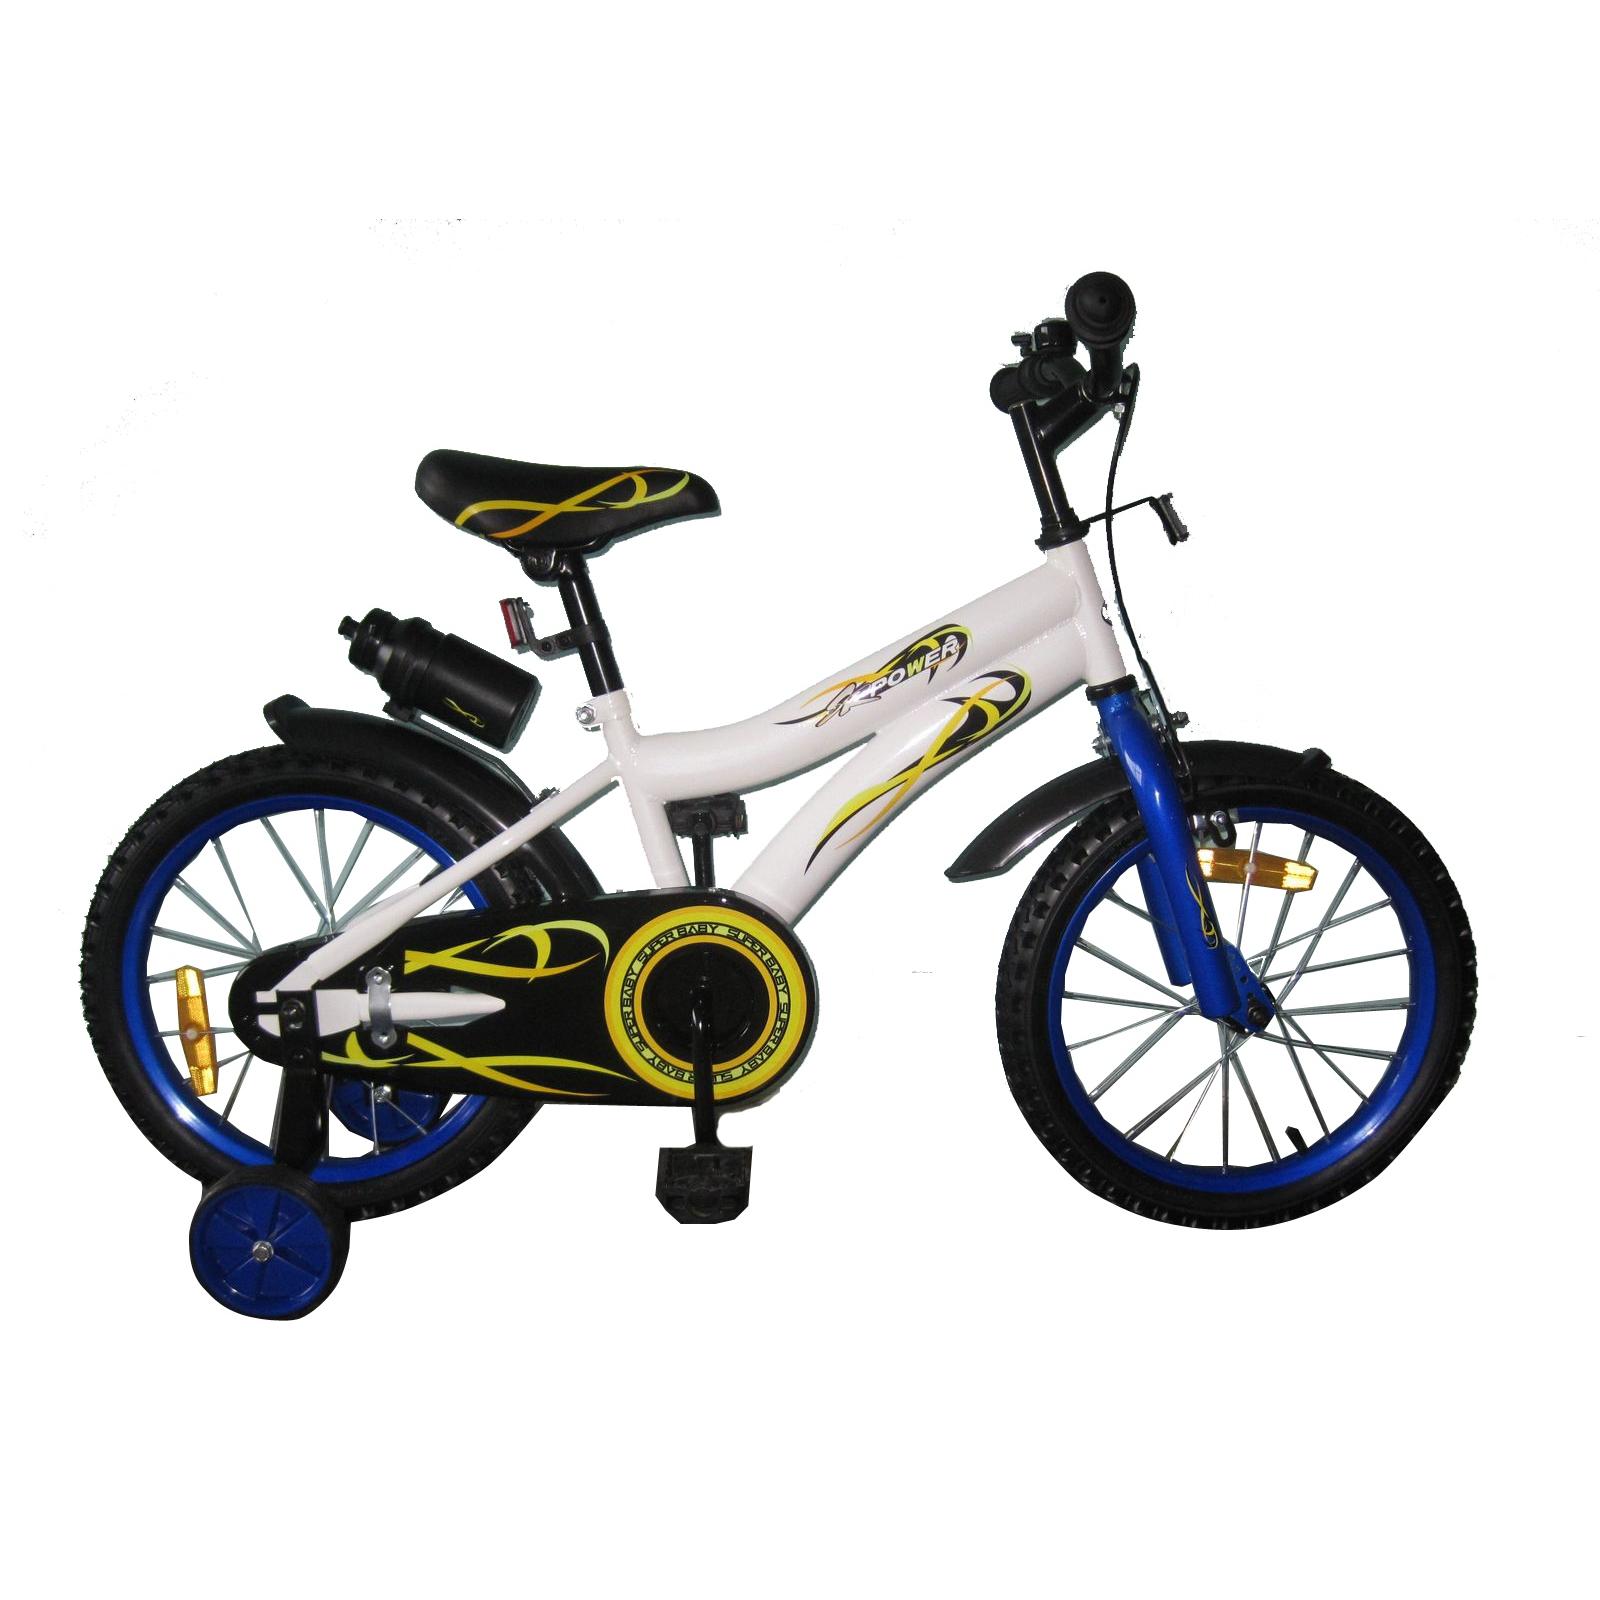 Детский велосипед BabyHit Swallow White with Blue (10170)